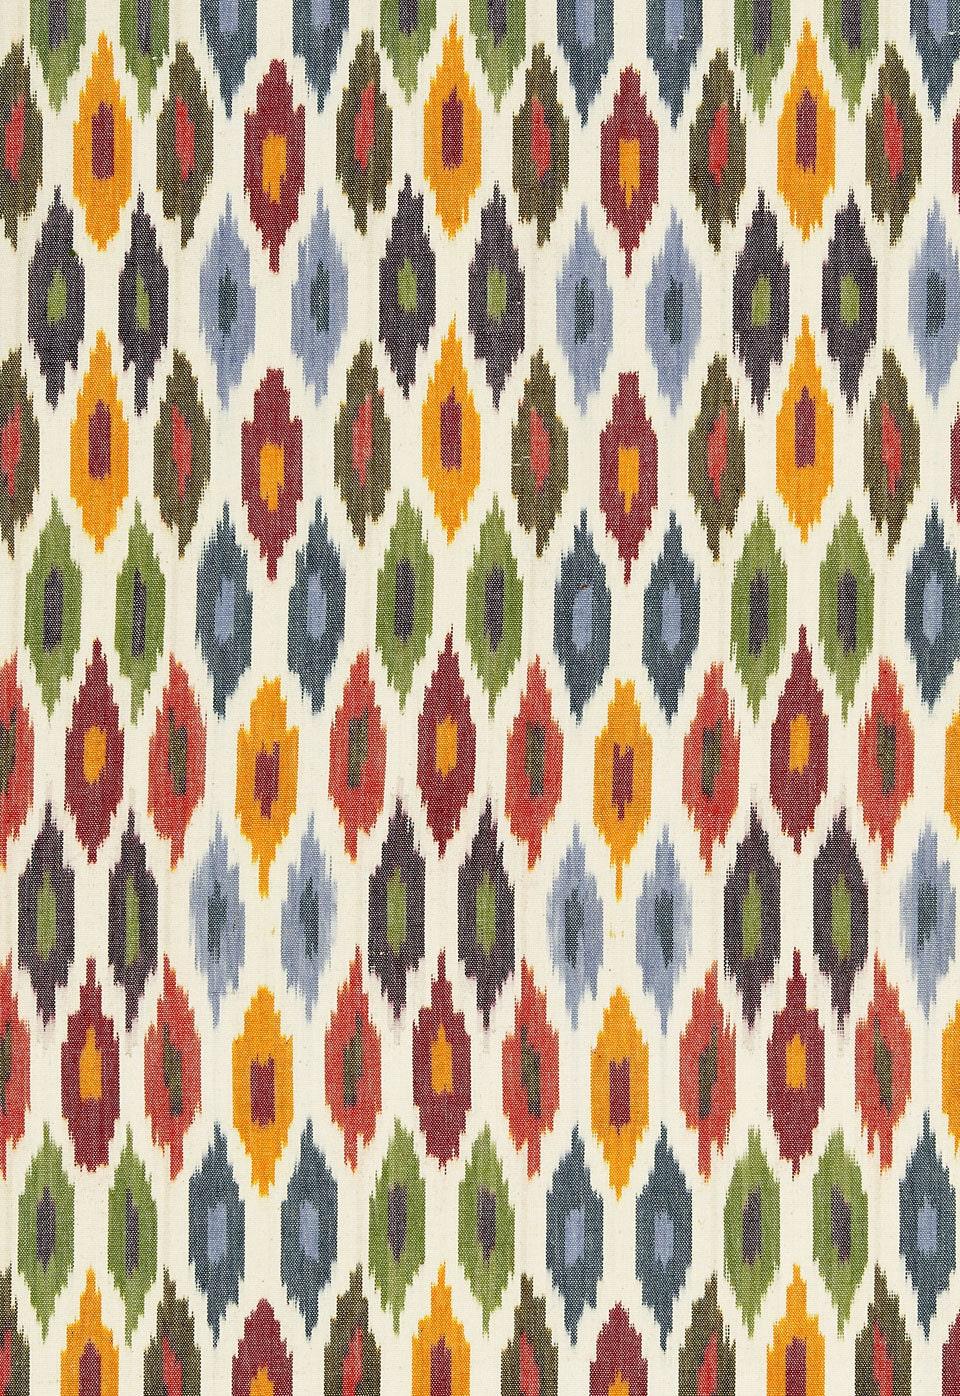 SCHUMACHER ethnique Chic Sunara IKAT KILIM coton coton coton tissu 10 verges Spice 8d69c1